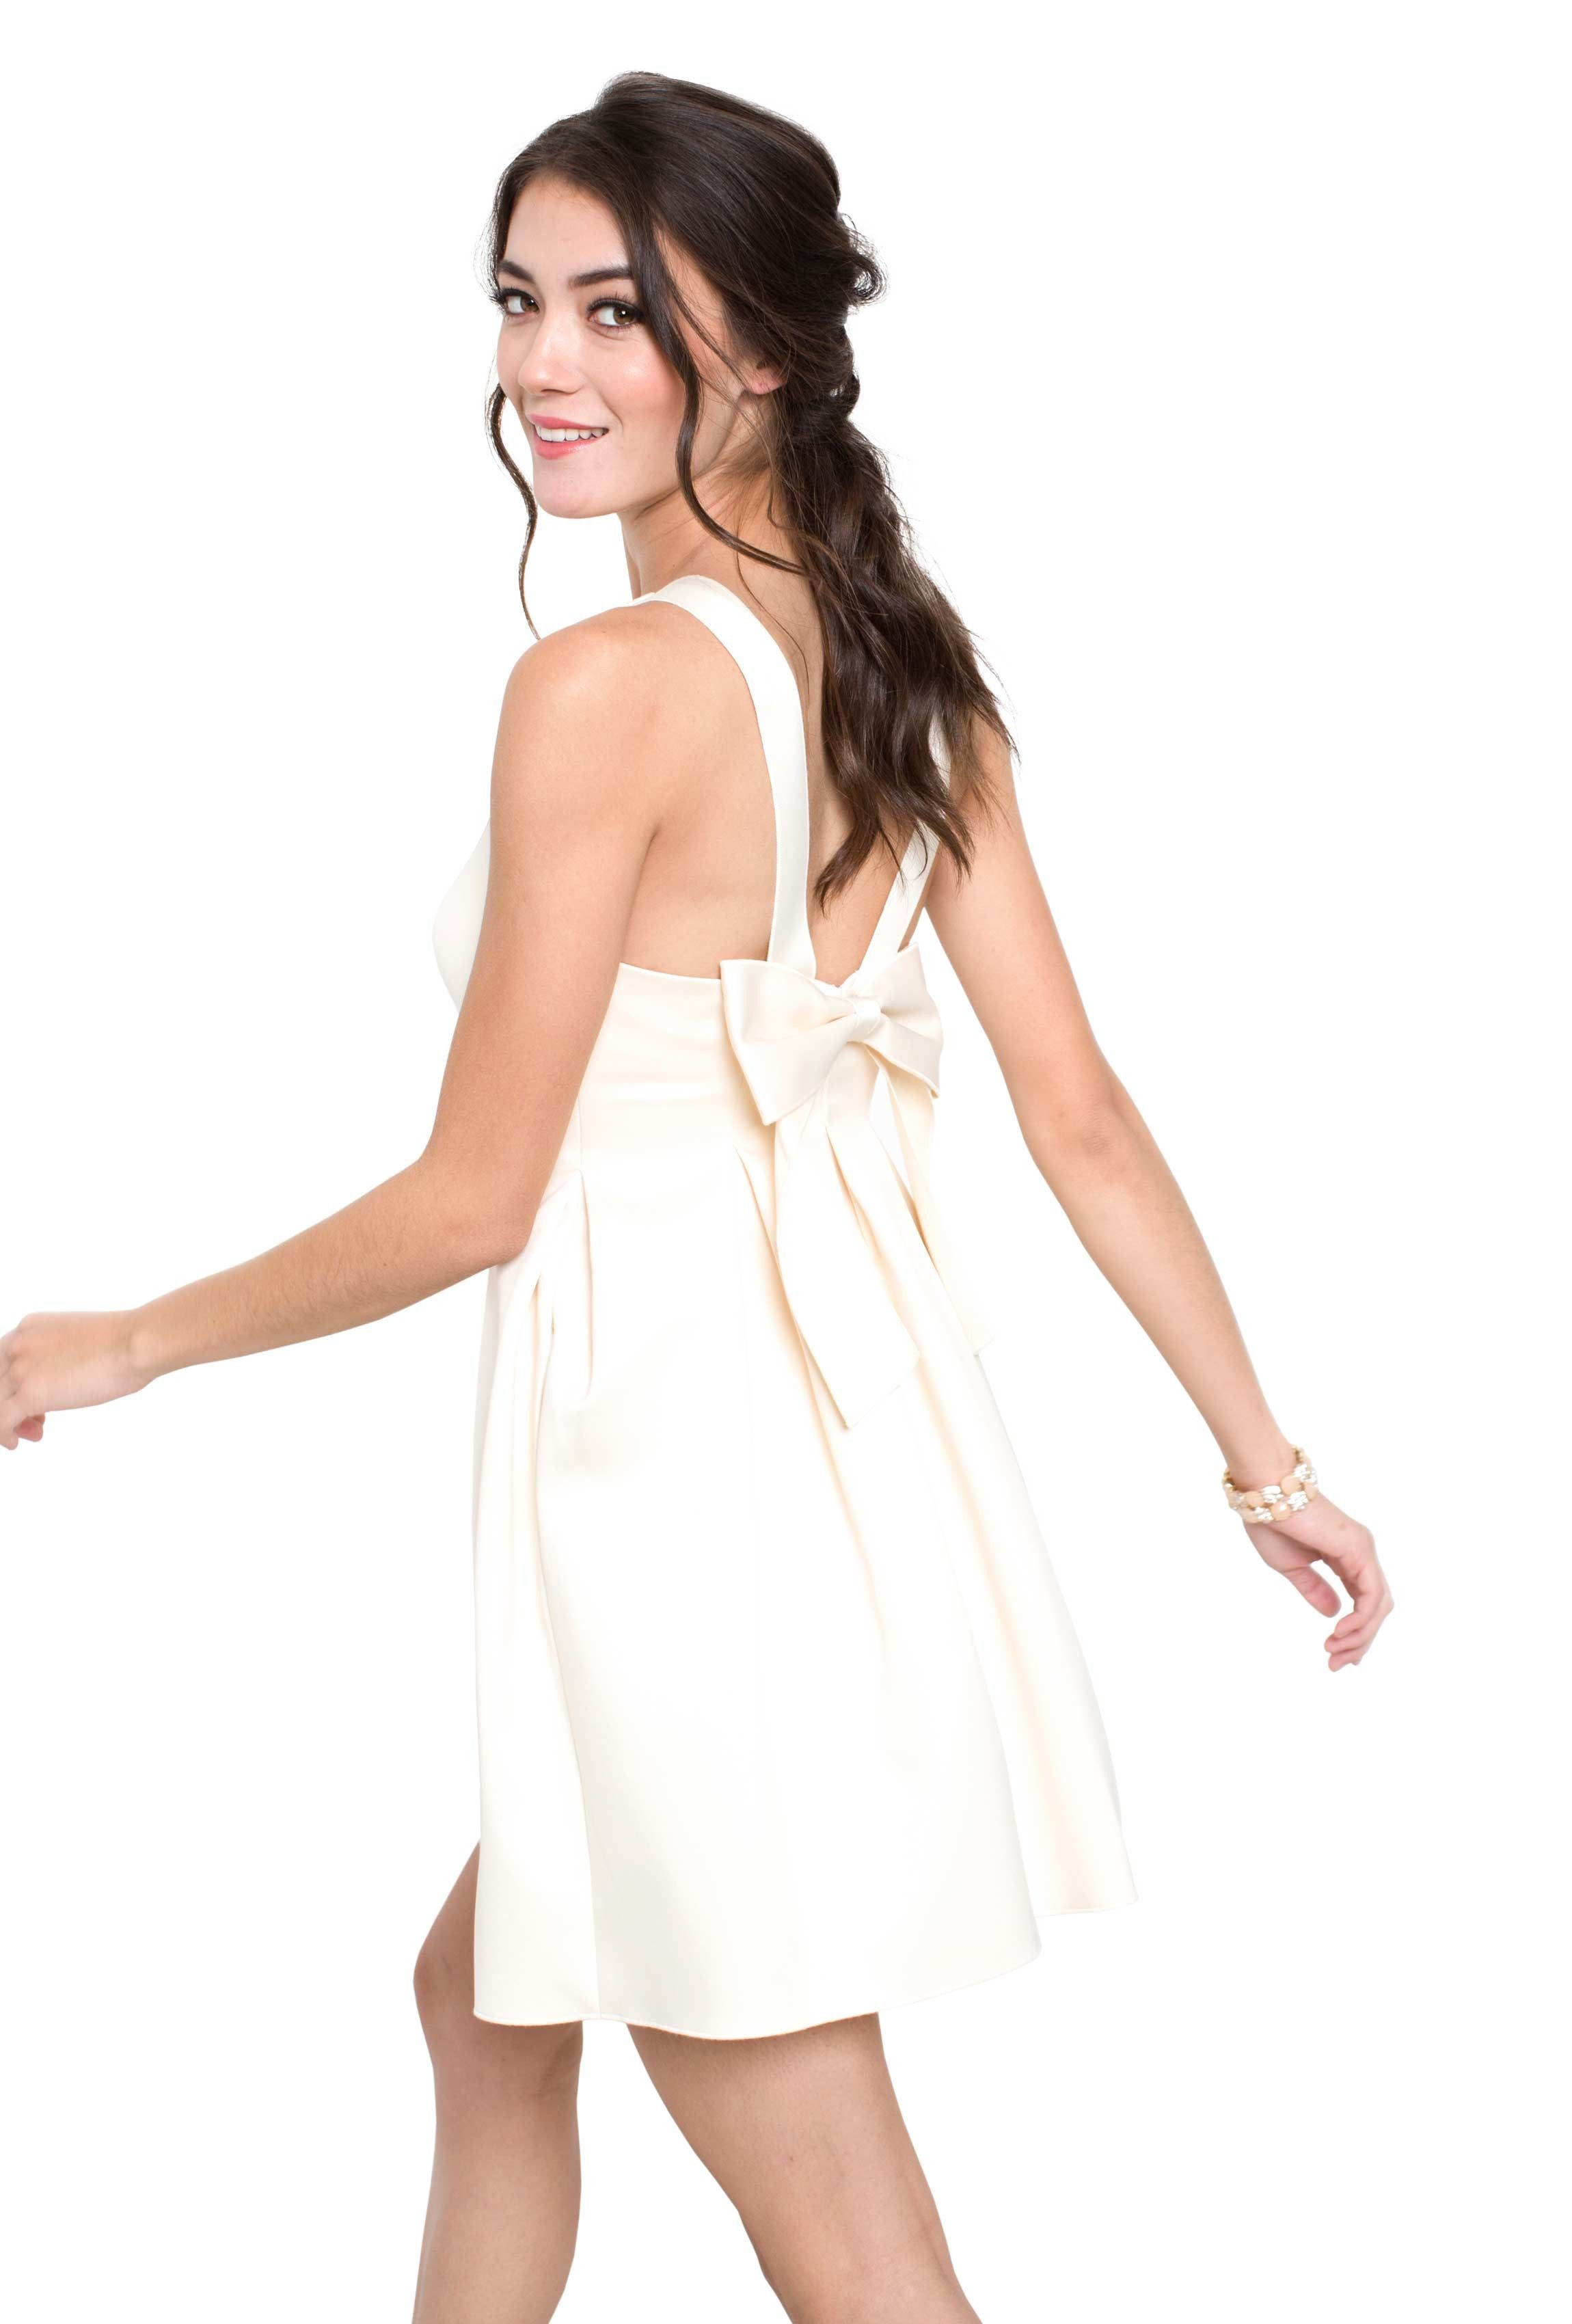 Cynthia rowley jenna white satin bridal dresses and wedding